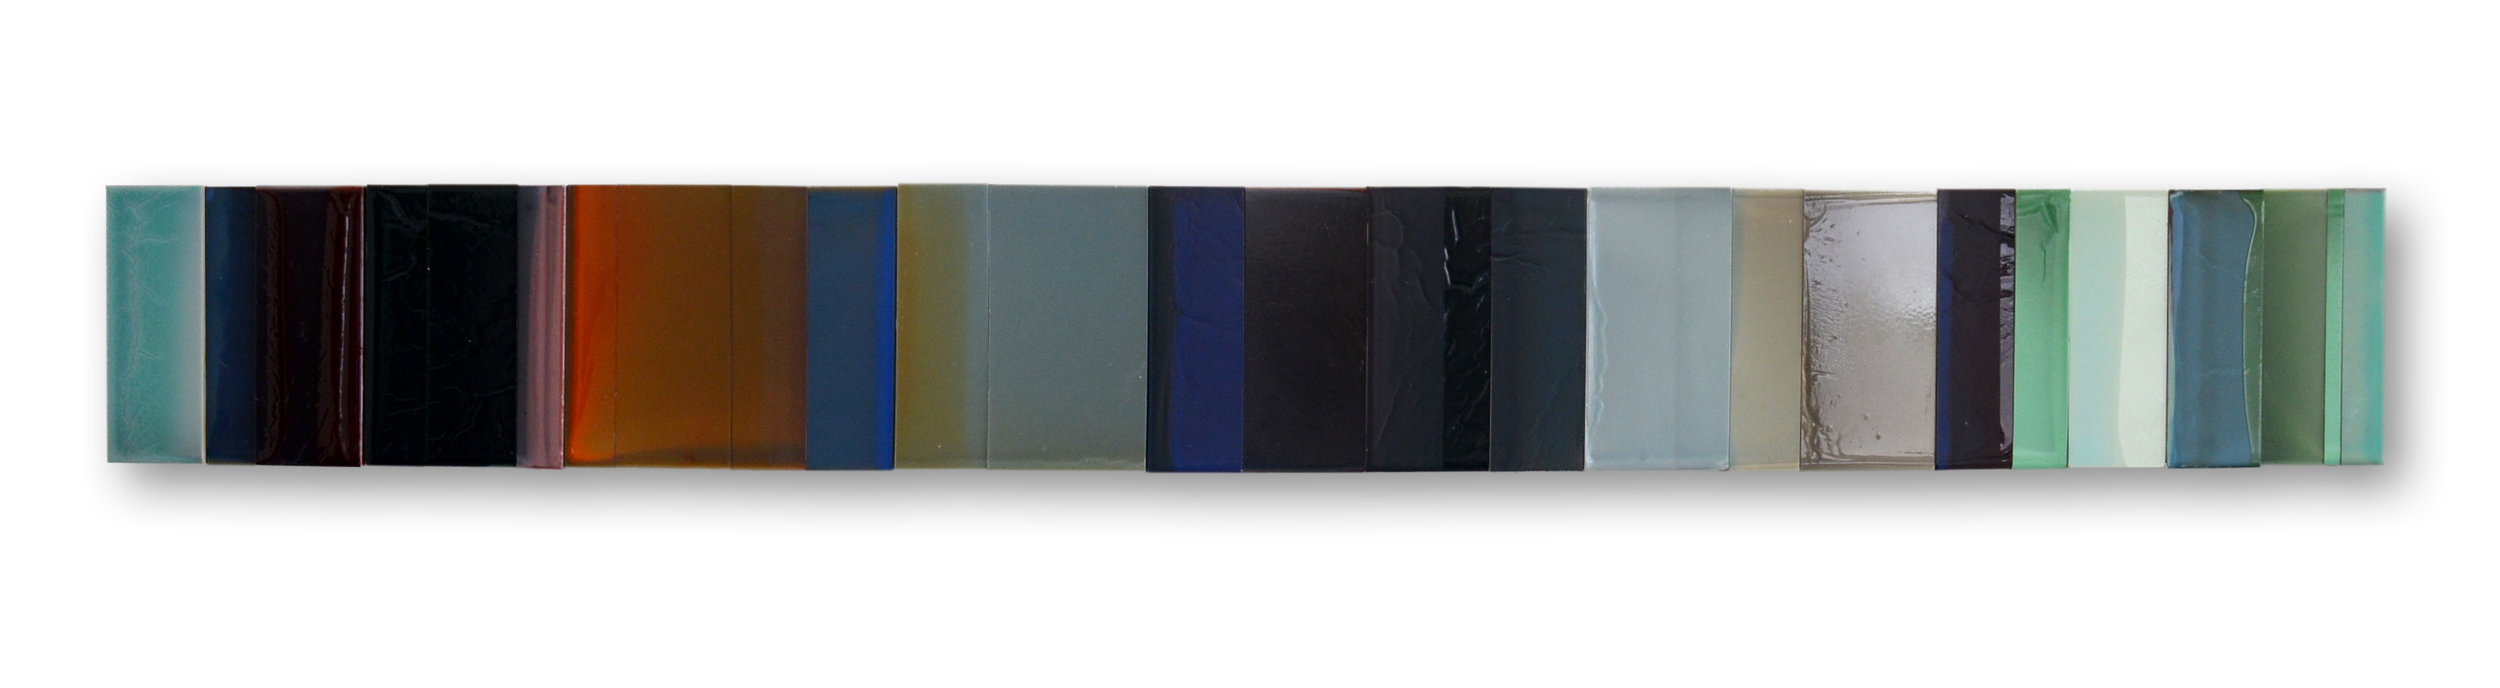 "Time No.1.  6""x 51"" polymer on panel 2015"